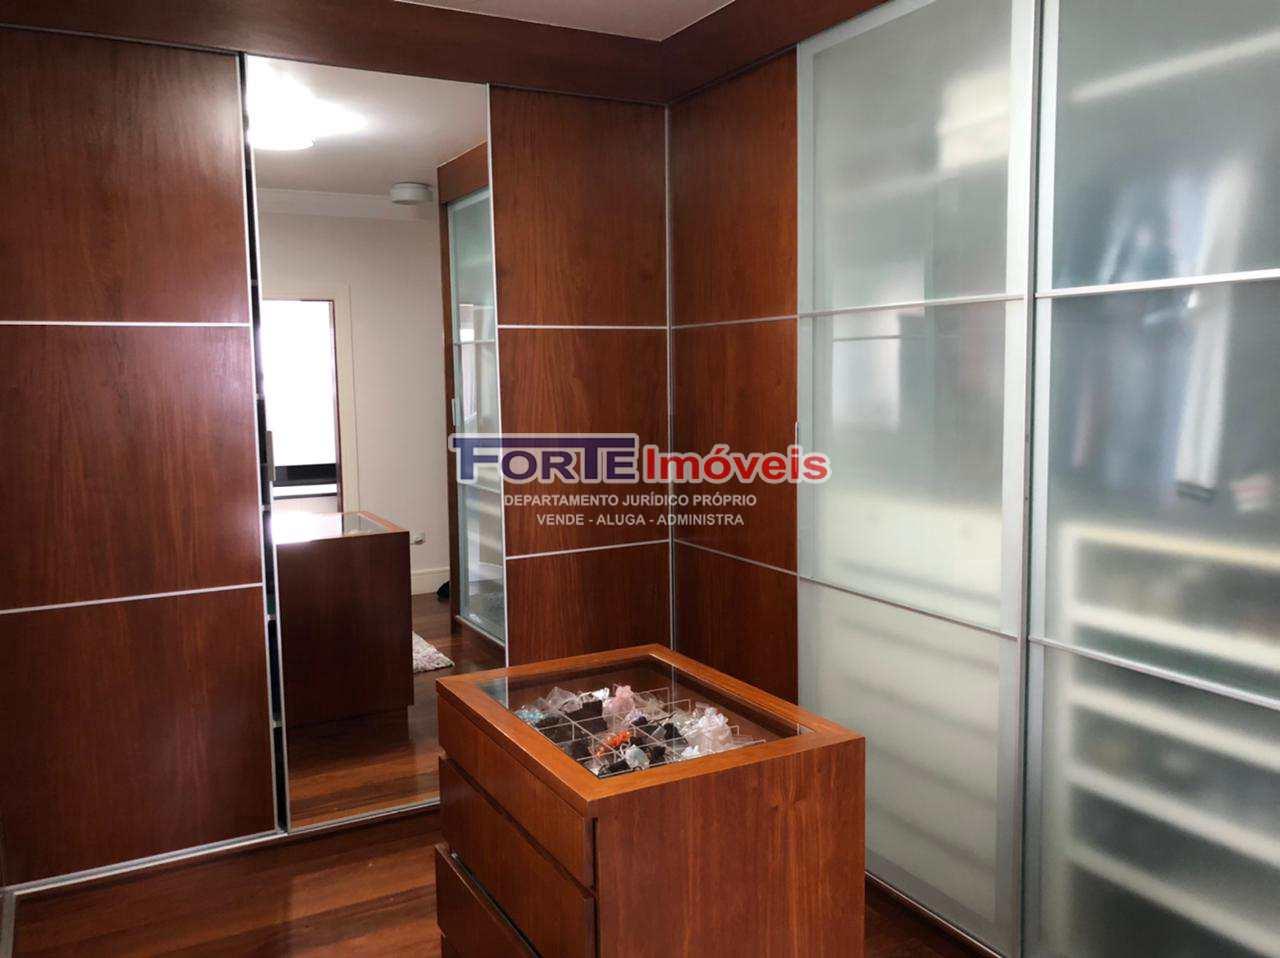 Casa com 4 dorms, Jardim Virginia Bianca, São Paulo - R$ 3.9 mi, Cod: 42903736